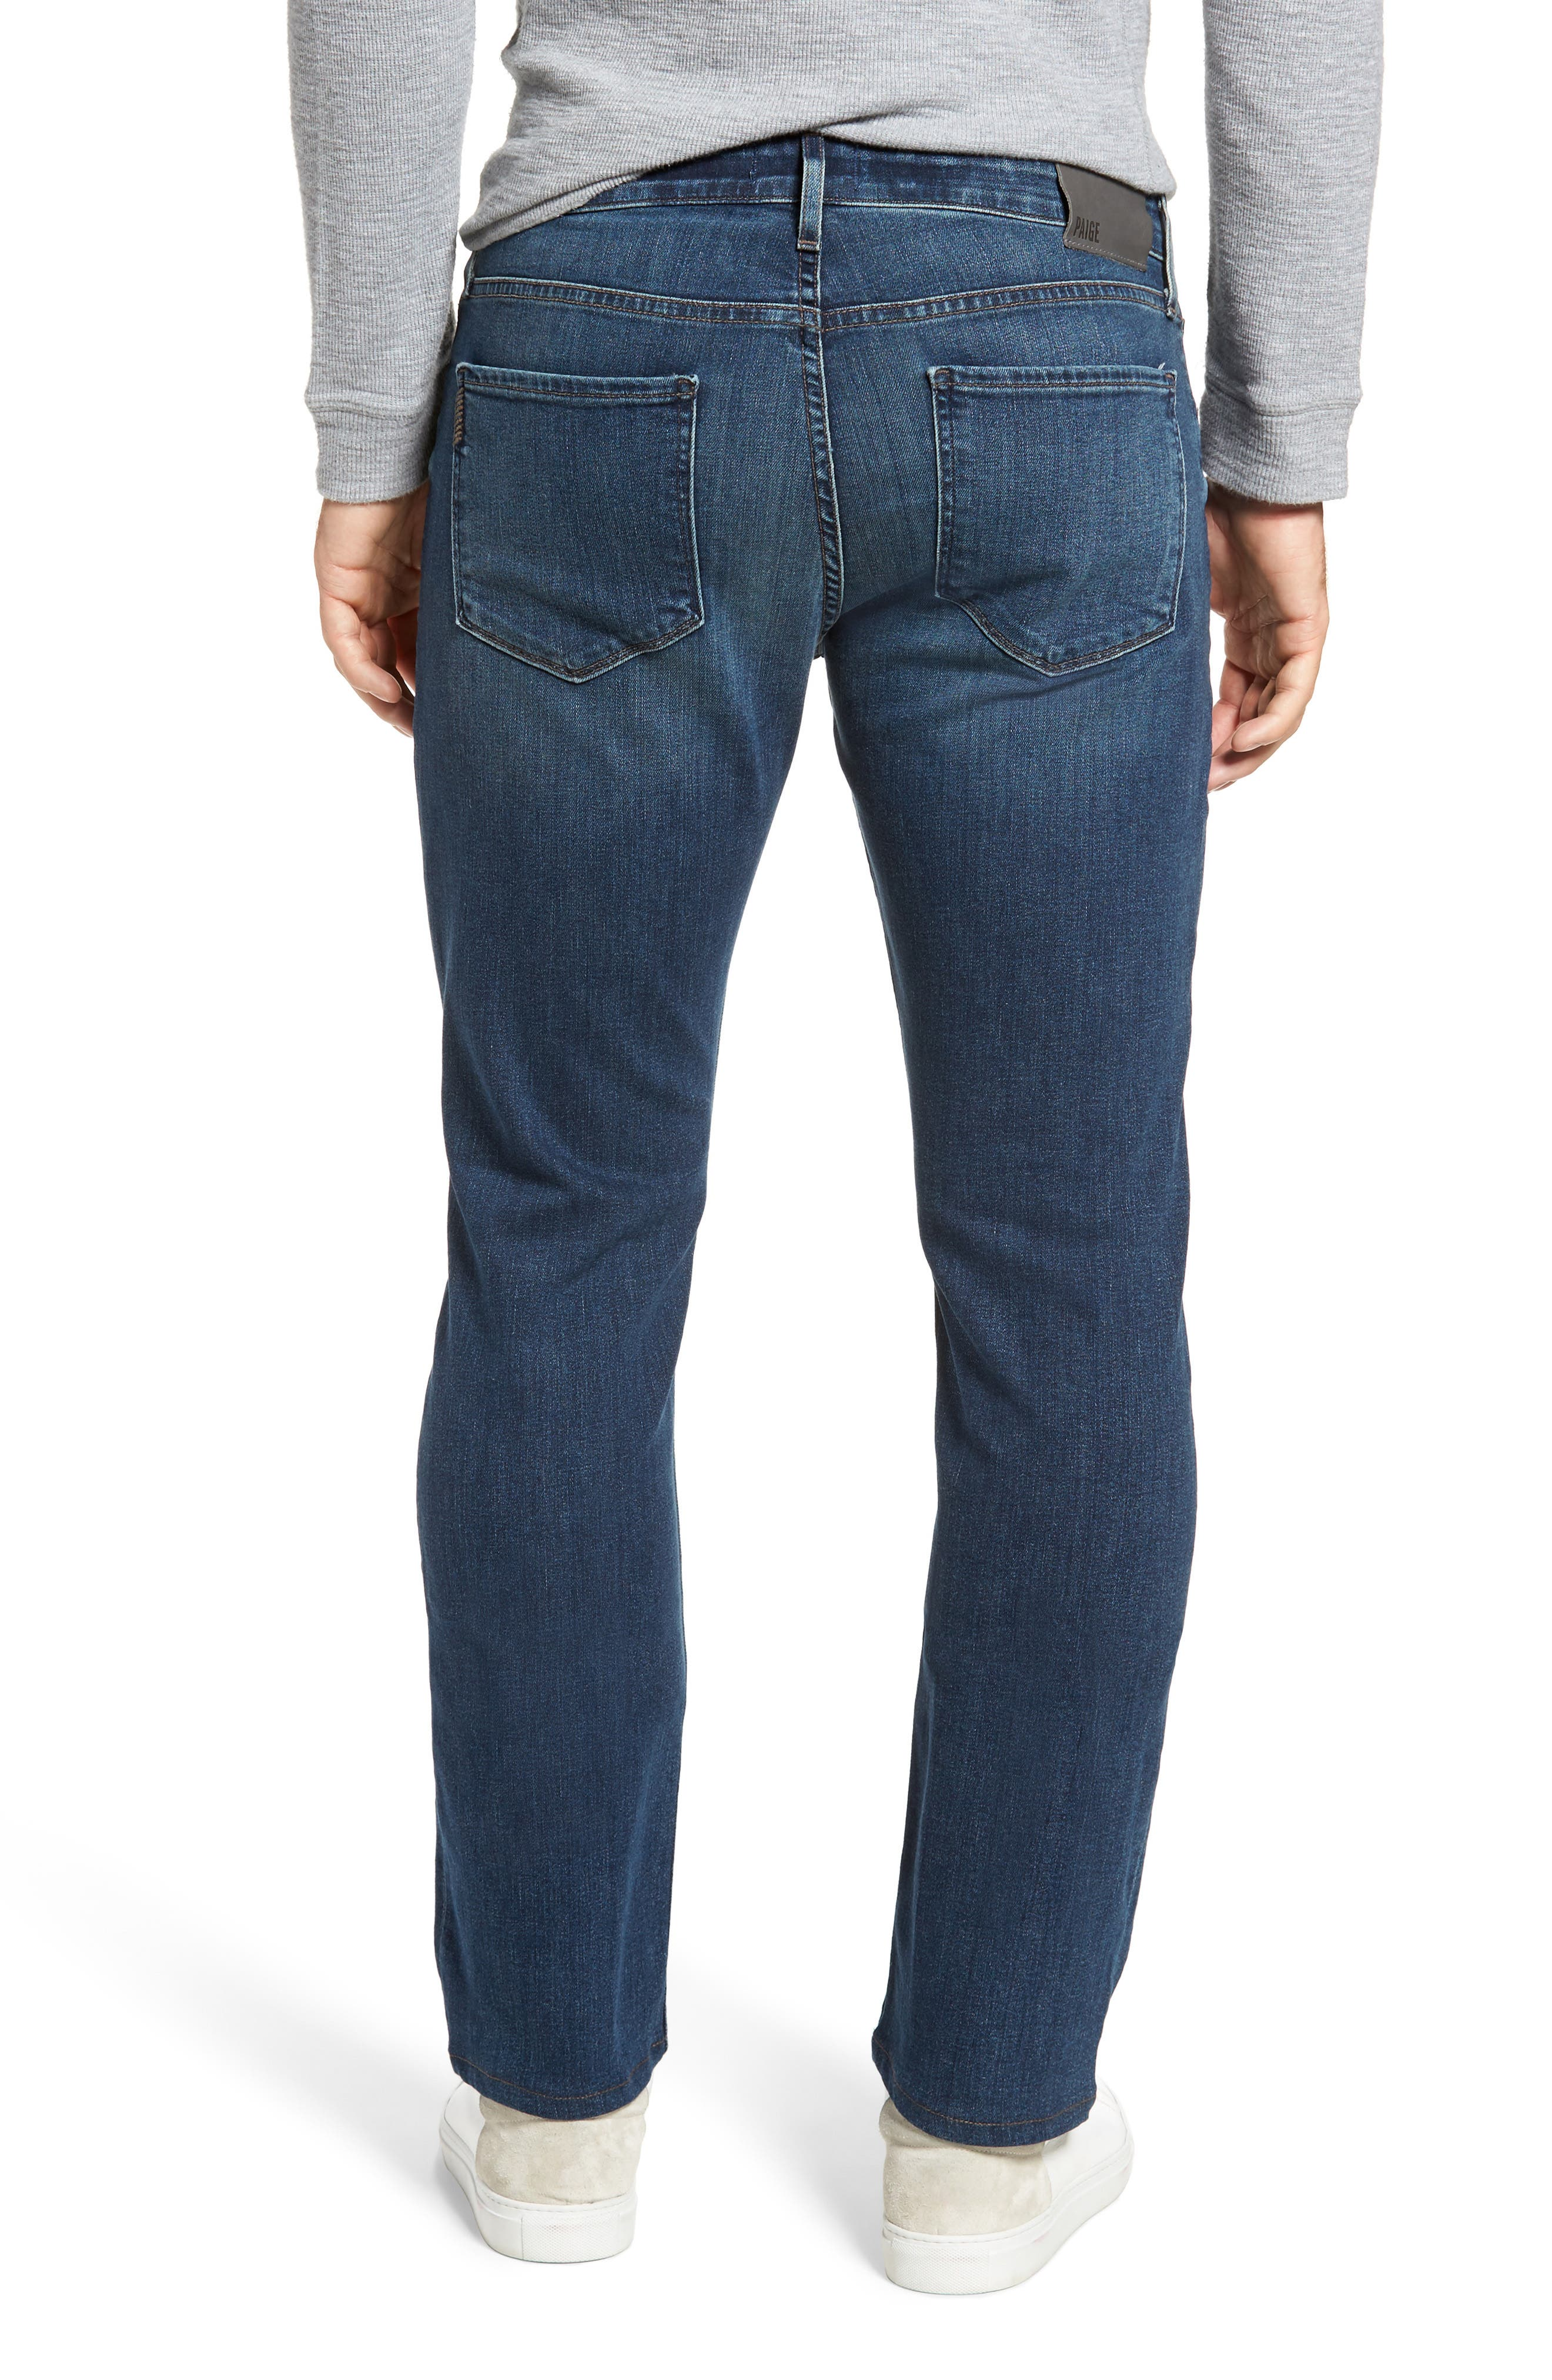 Legacy - Normandie Straight Leg Jeans,                             Alternate thumbnail 2, color,                             Ewan